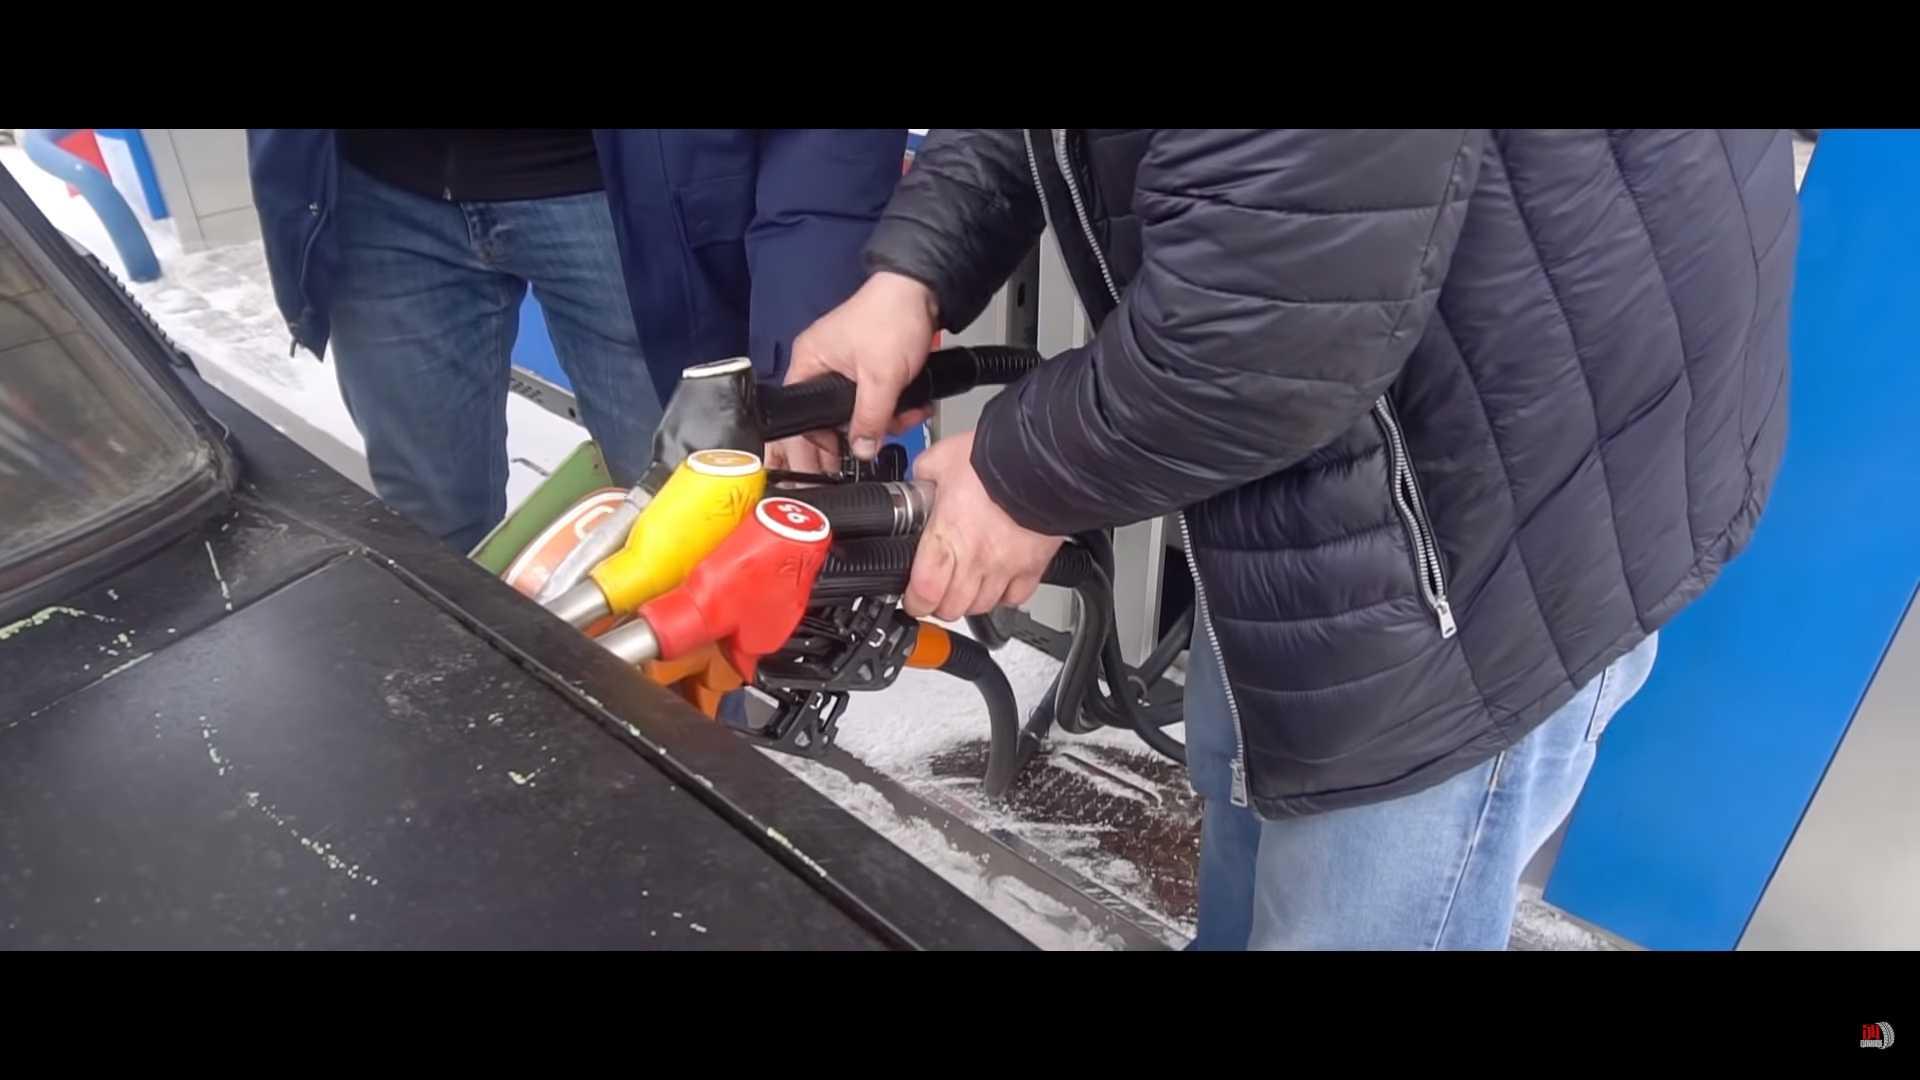 VIDEO: Rus do auta natankoval 5 druhov paliva. Rozbehlo sa?